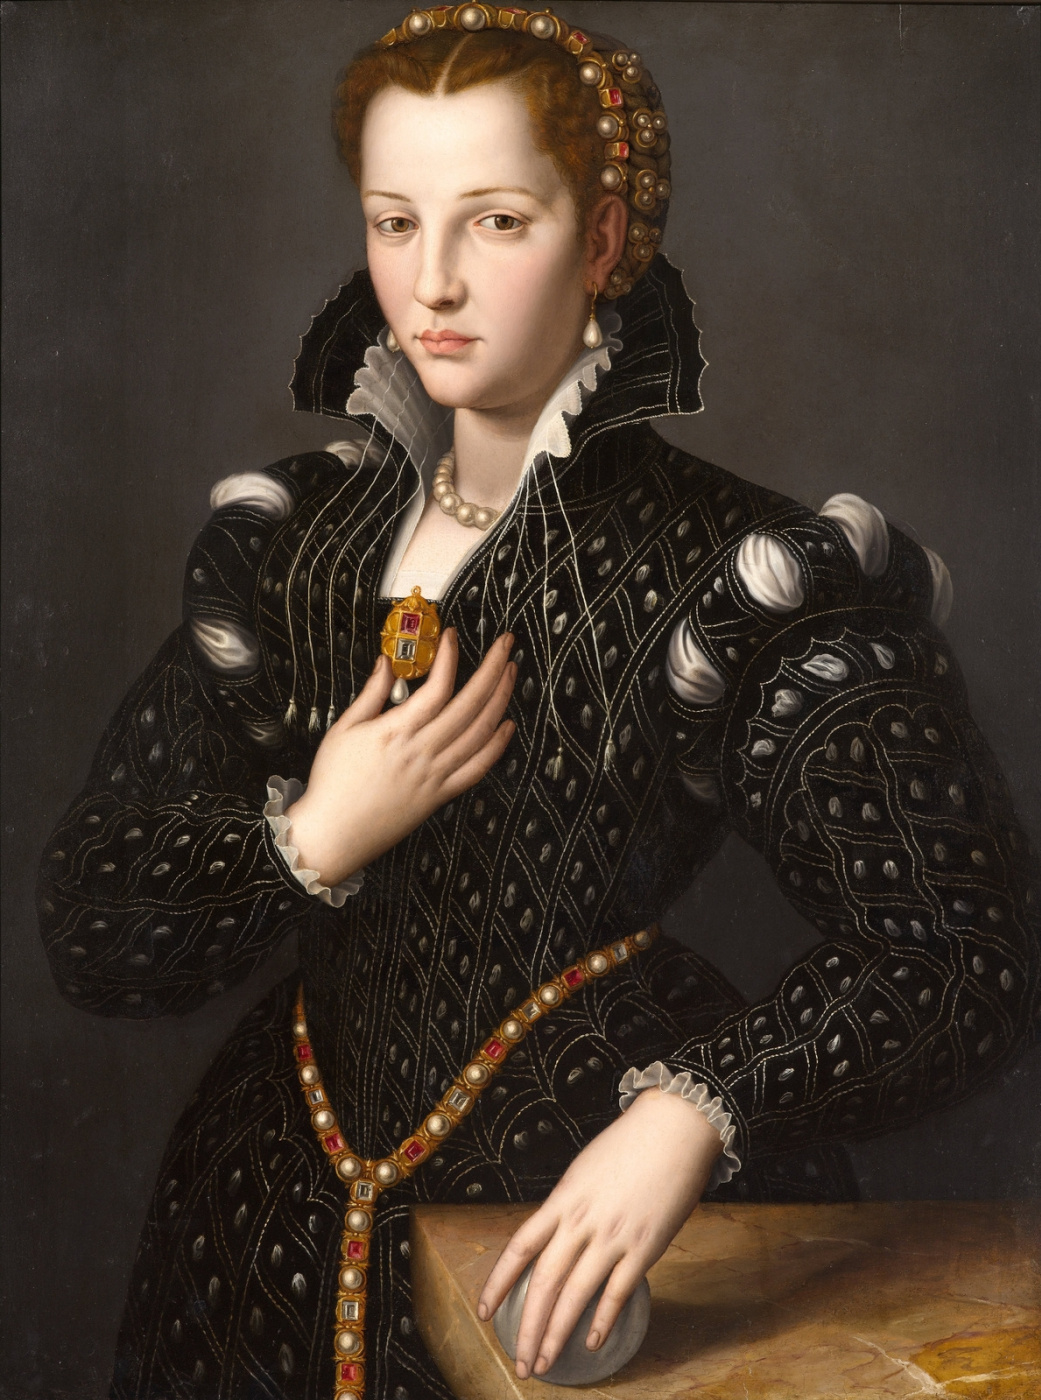 Alessandro Allori. Lucretia de Medici. 1560 (1545-1561)